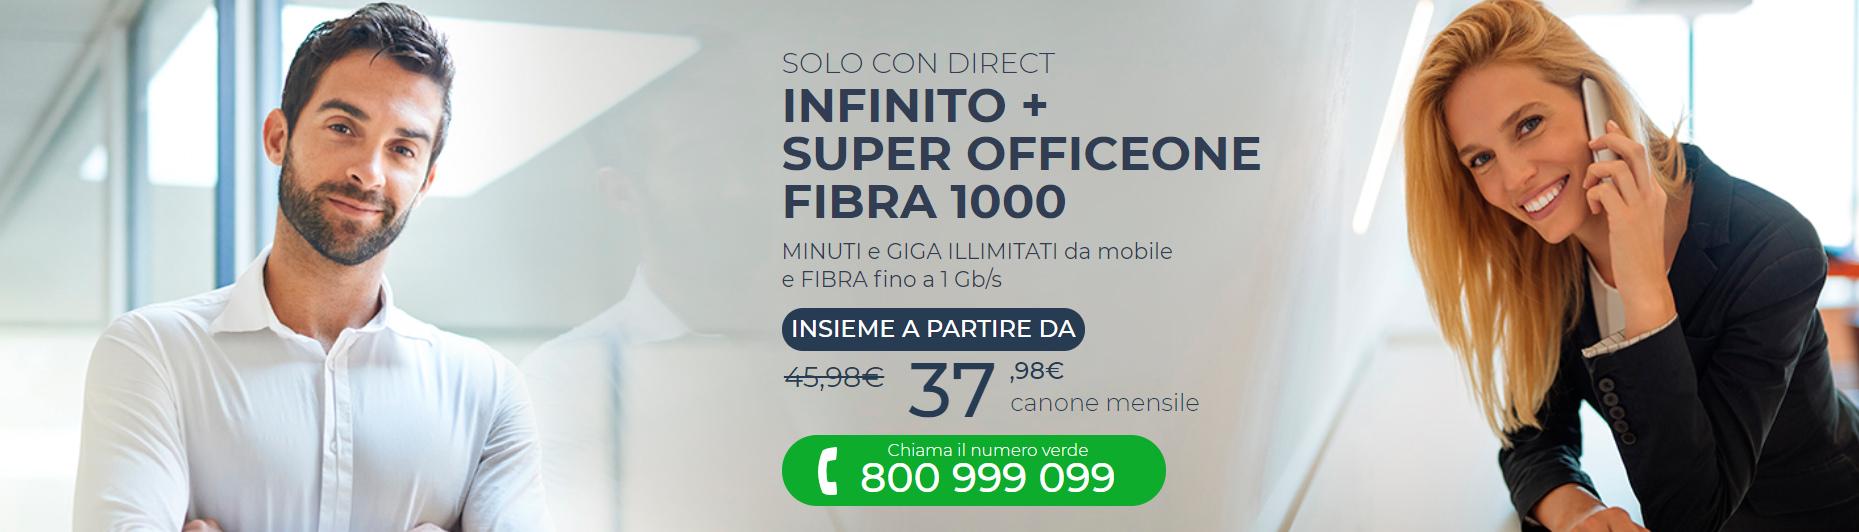 Wind Tre Super Office One Settembre 2020 Offerte Telefonia Mobile